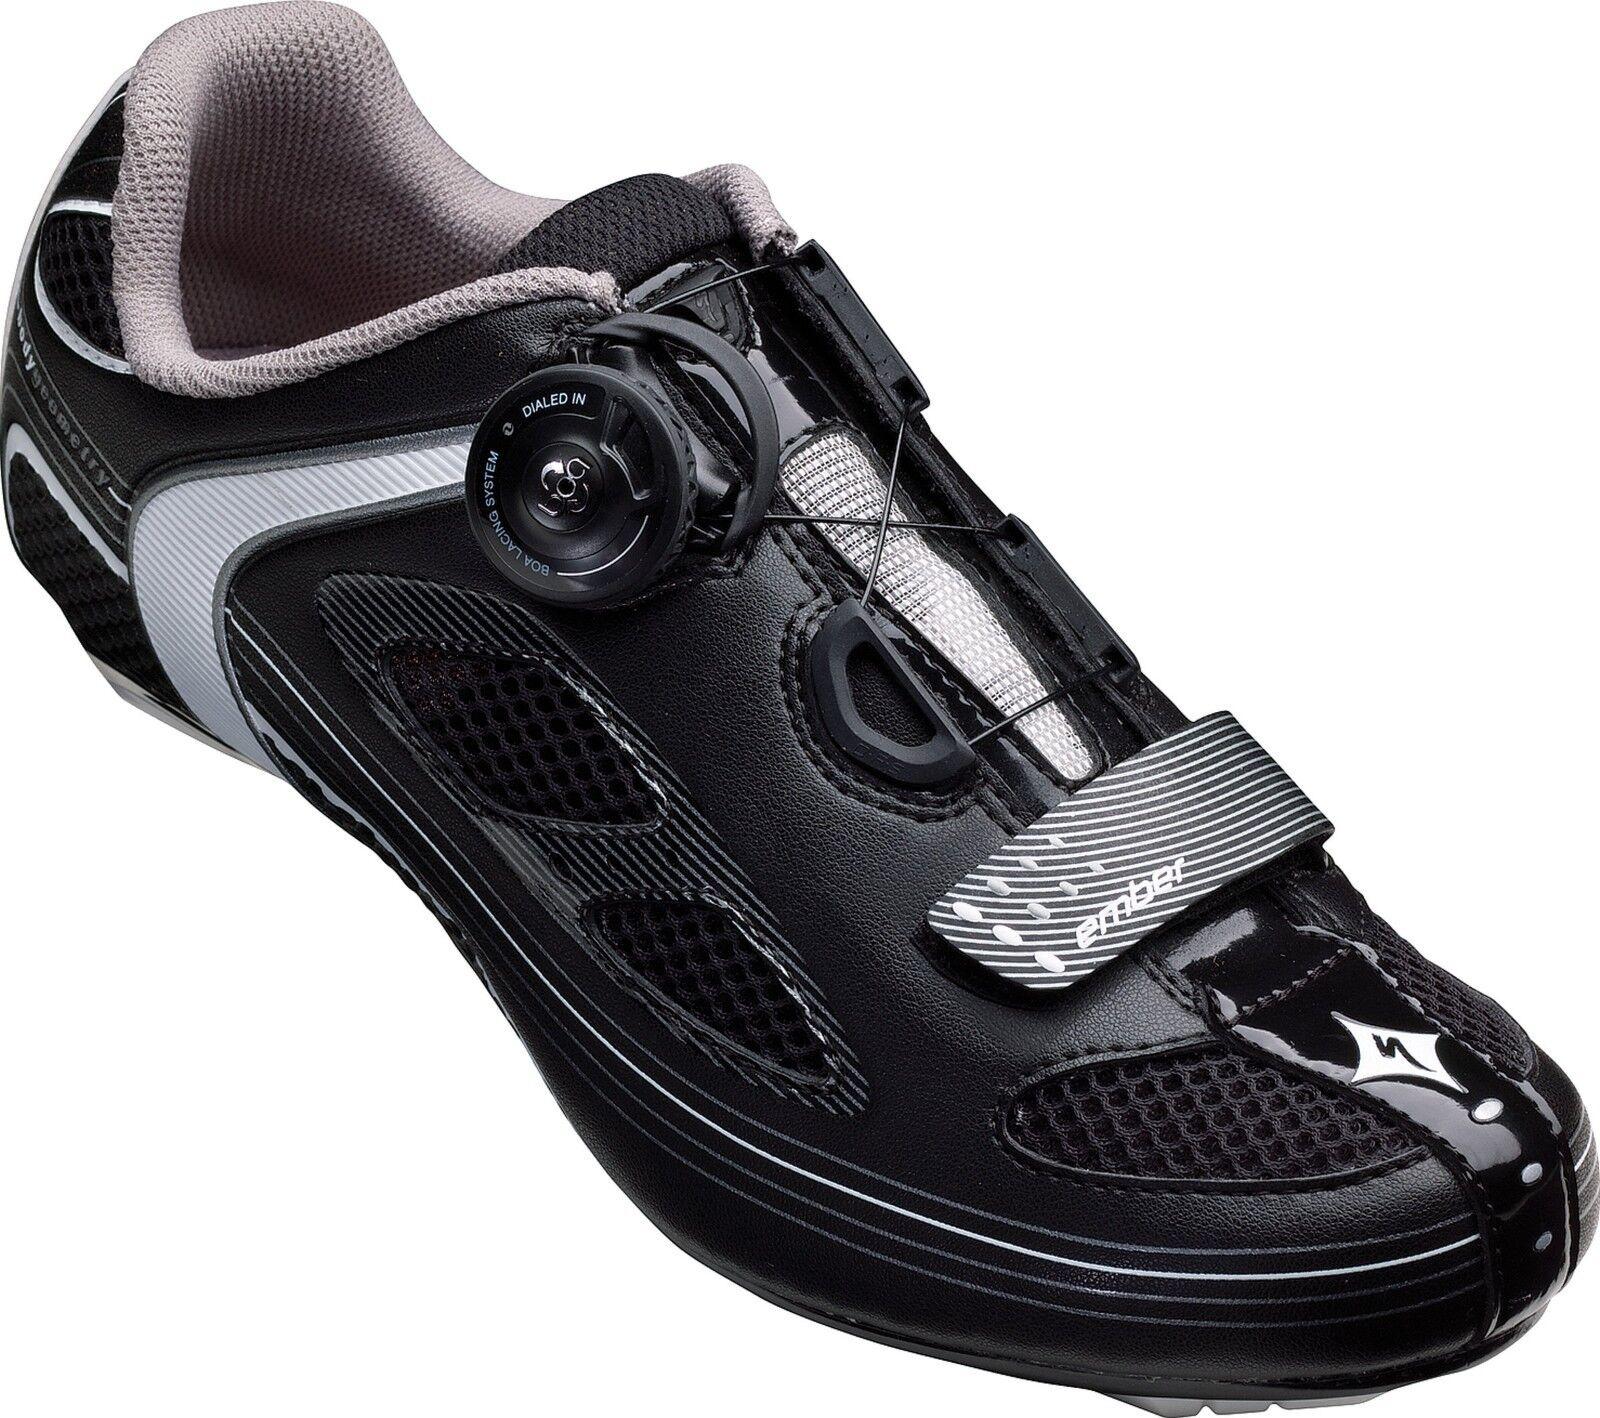 Specialized Ember Women's Road Bike Cycling shoes SZ 36 6 3-Bolt SPD-SL BOA Tri